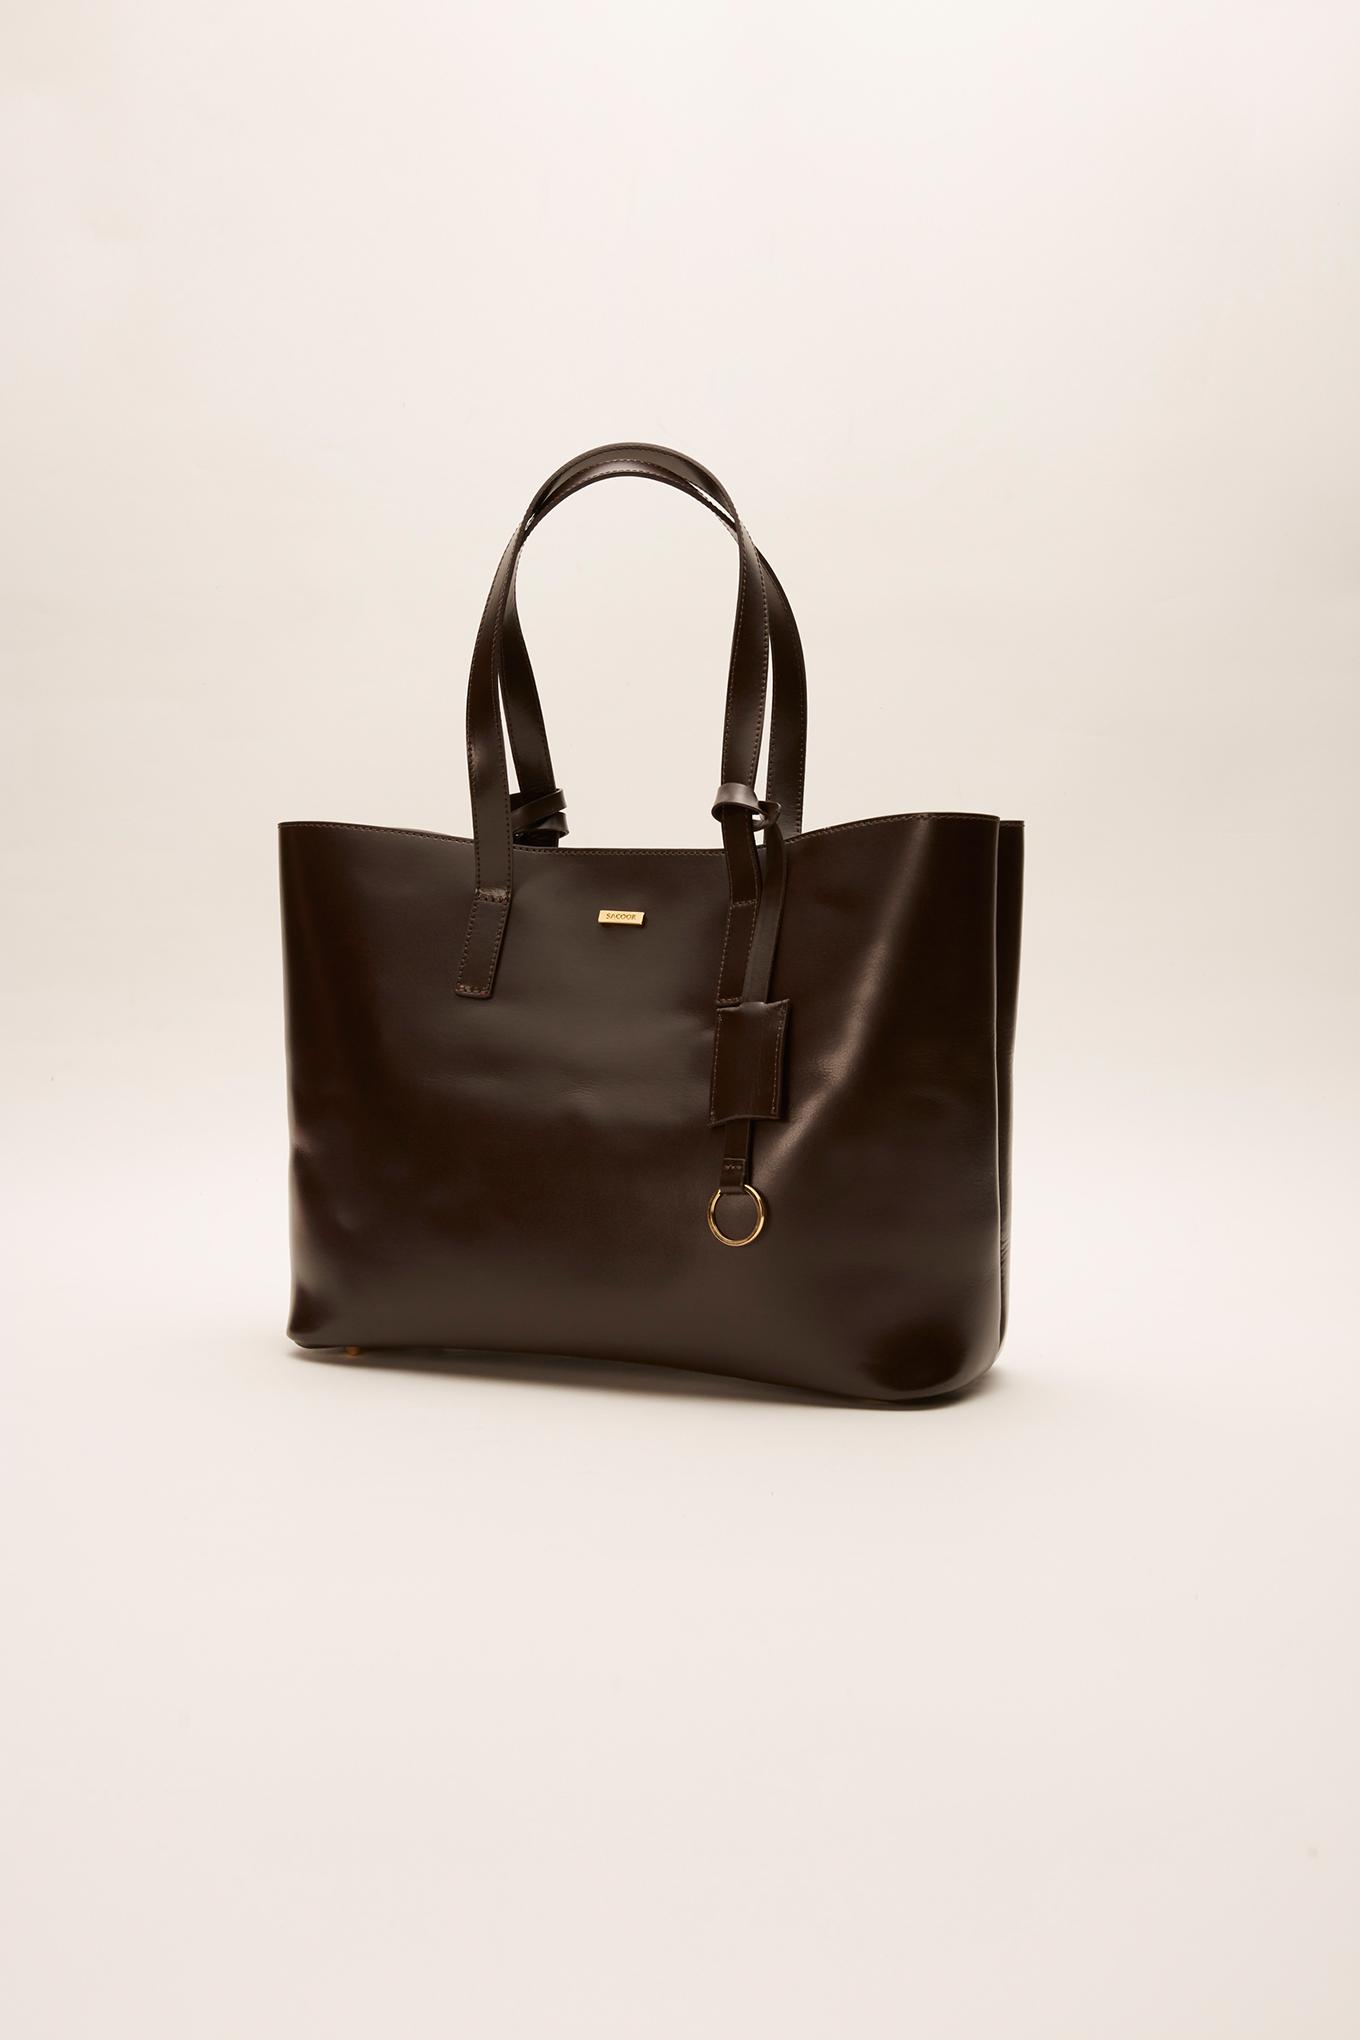 Bag Chocolate Classic Woman